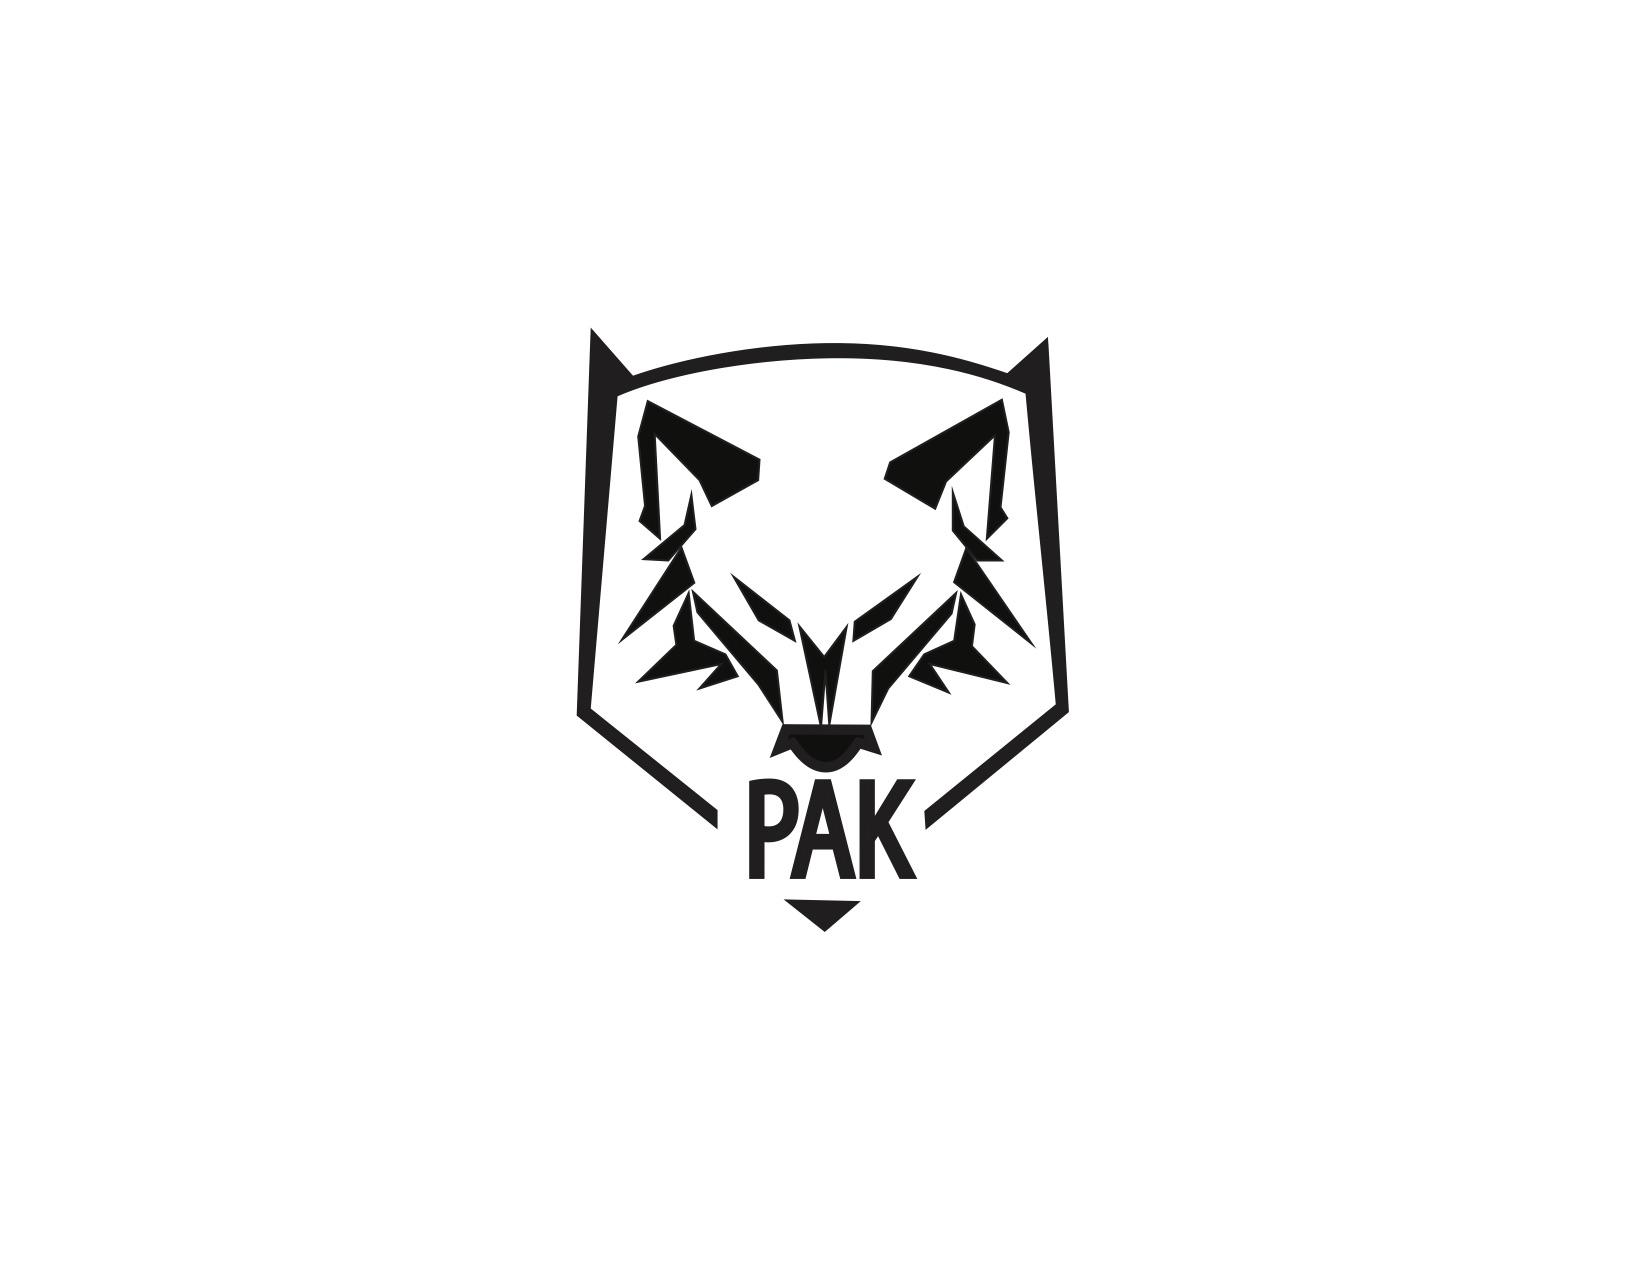 wolf pak